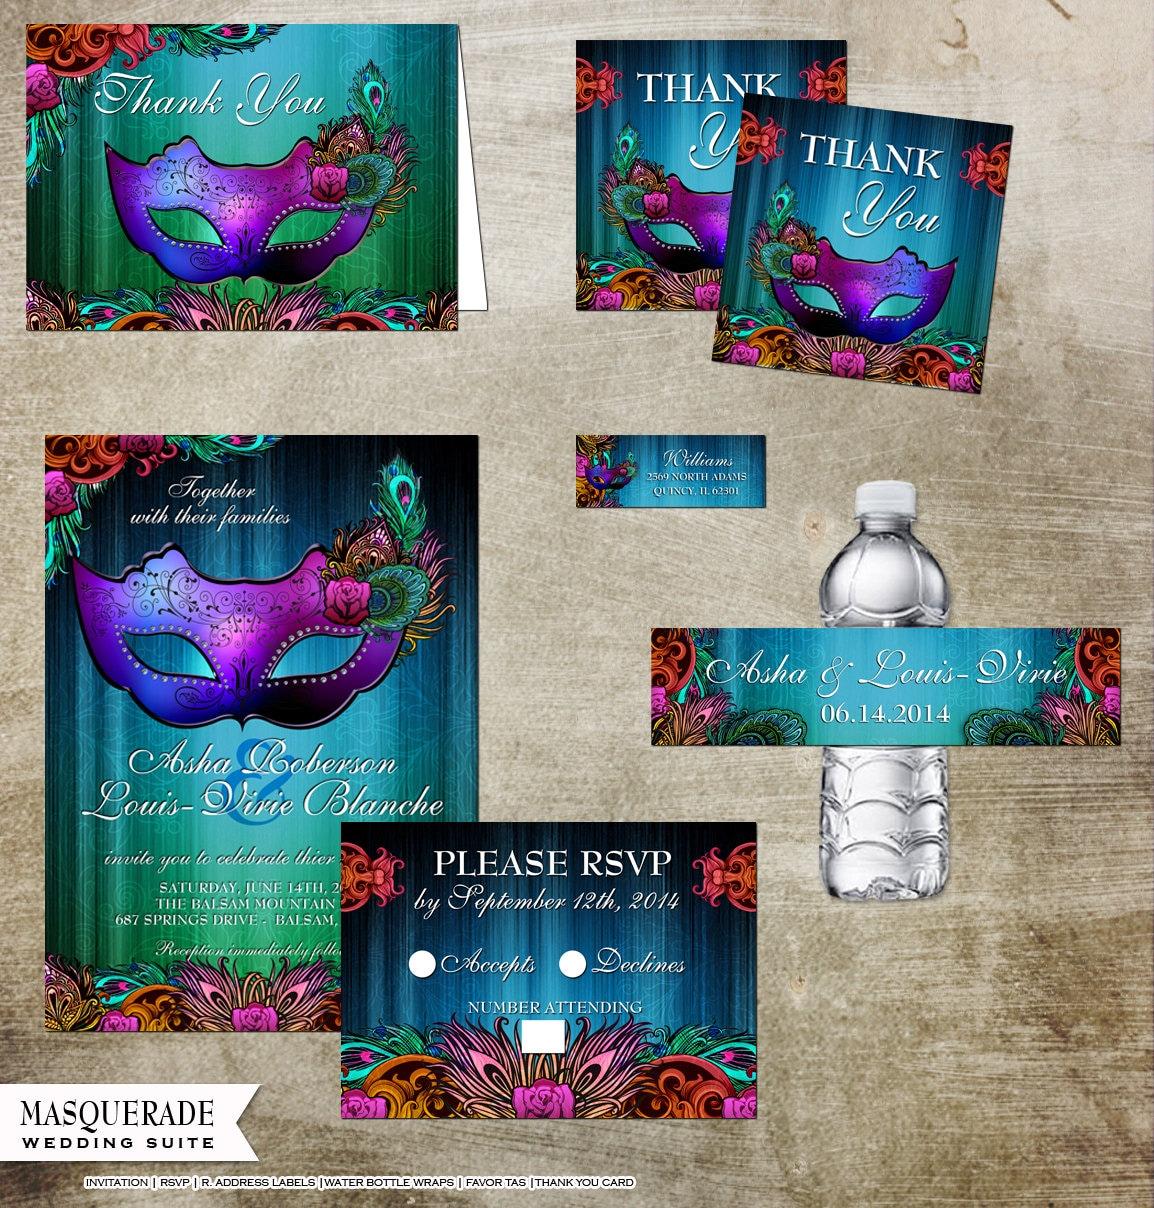 Masquerade Wedding Invitations: Masquerade Wedding Invitation And Rsvp Suite Thank You Favors